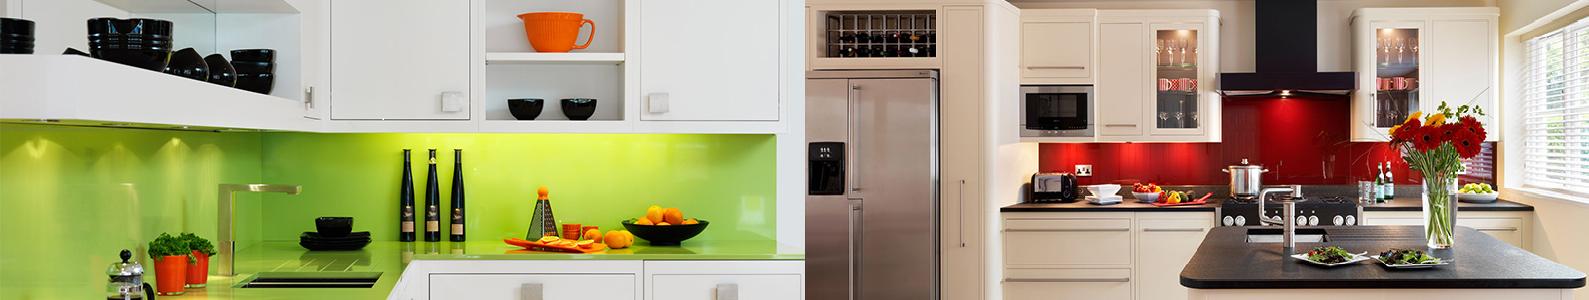 glass_kitchen_splashback_mauritius_03_birmingham.mu